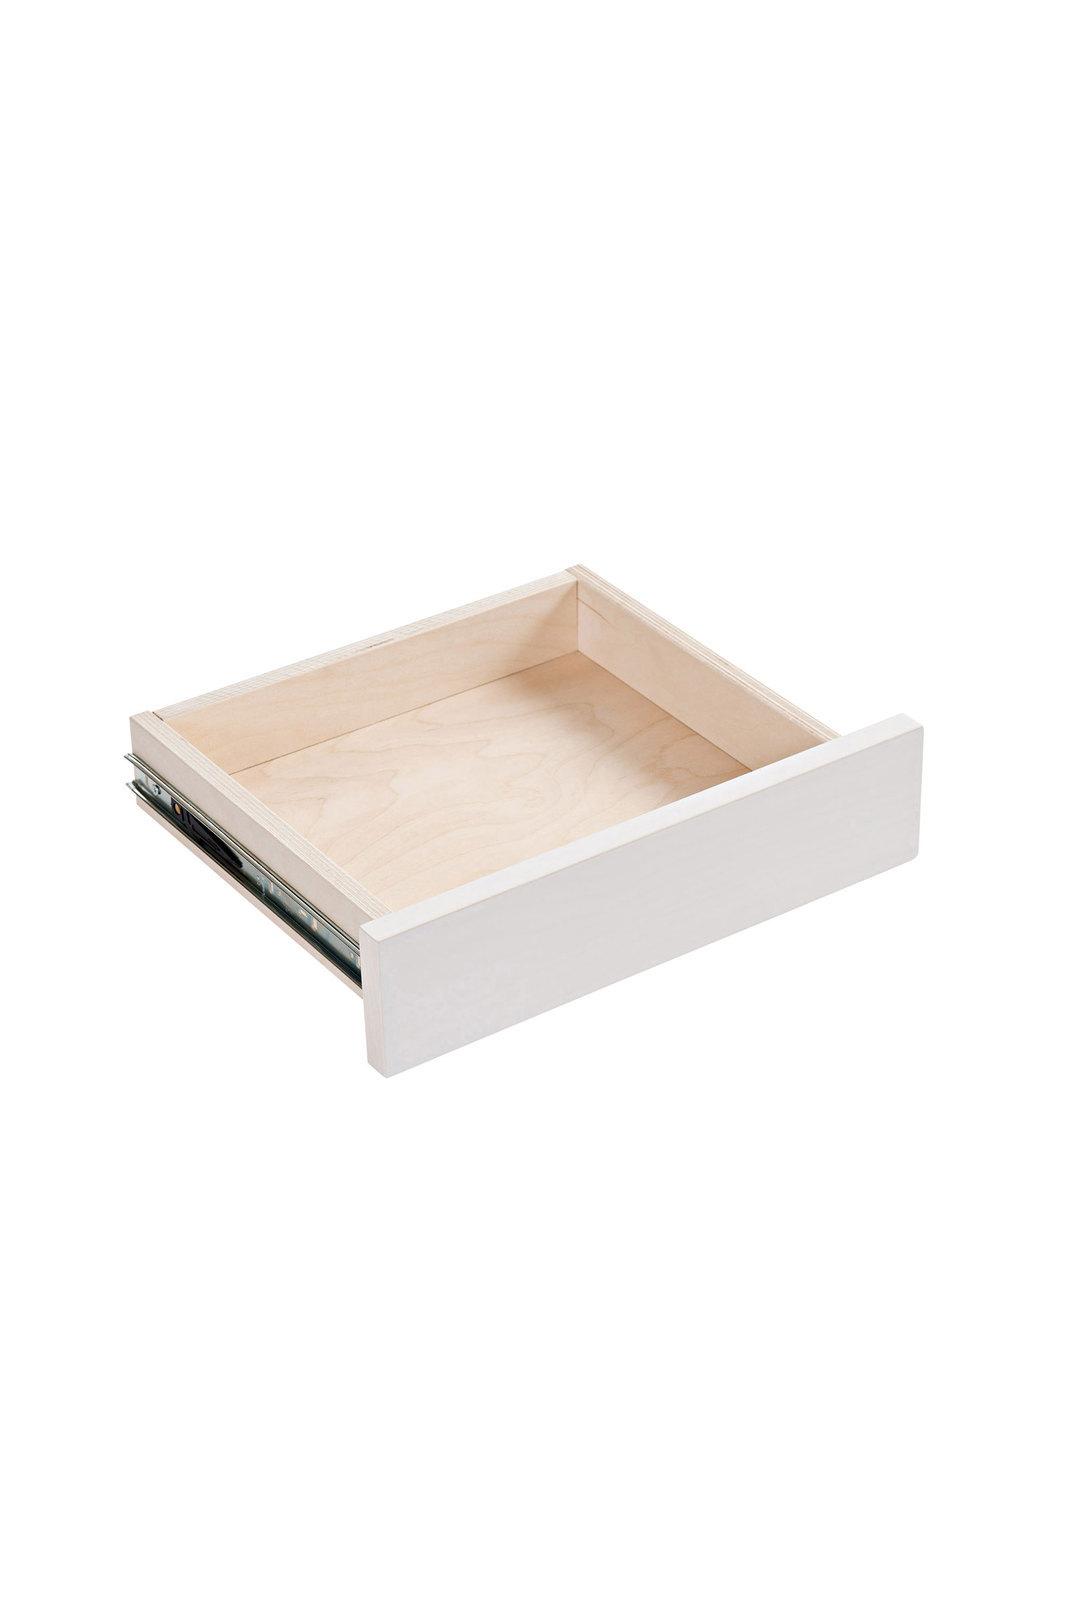 Värilaatikko (Softclose)